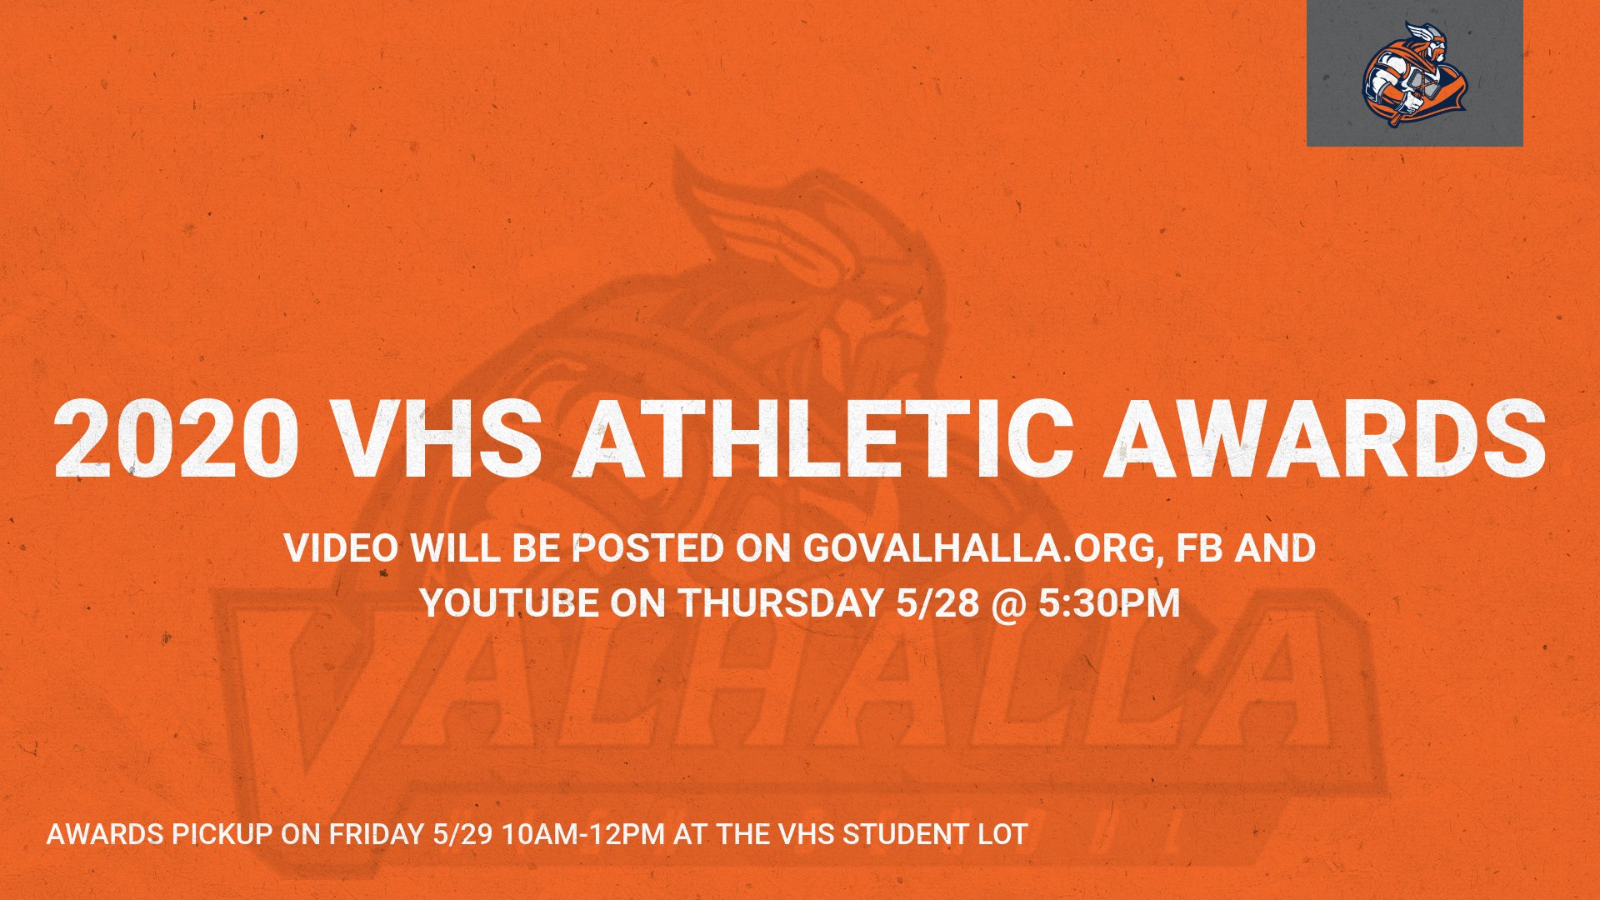 2020 VHS Athletic Awards